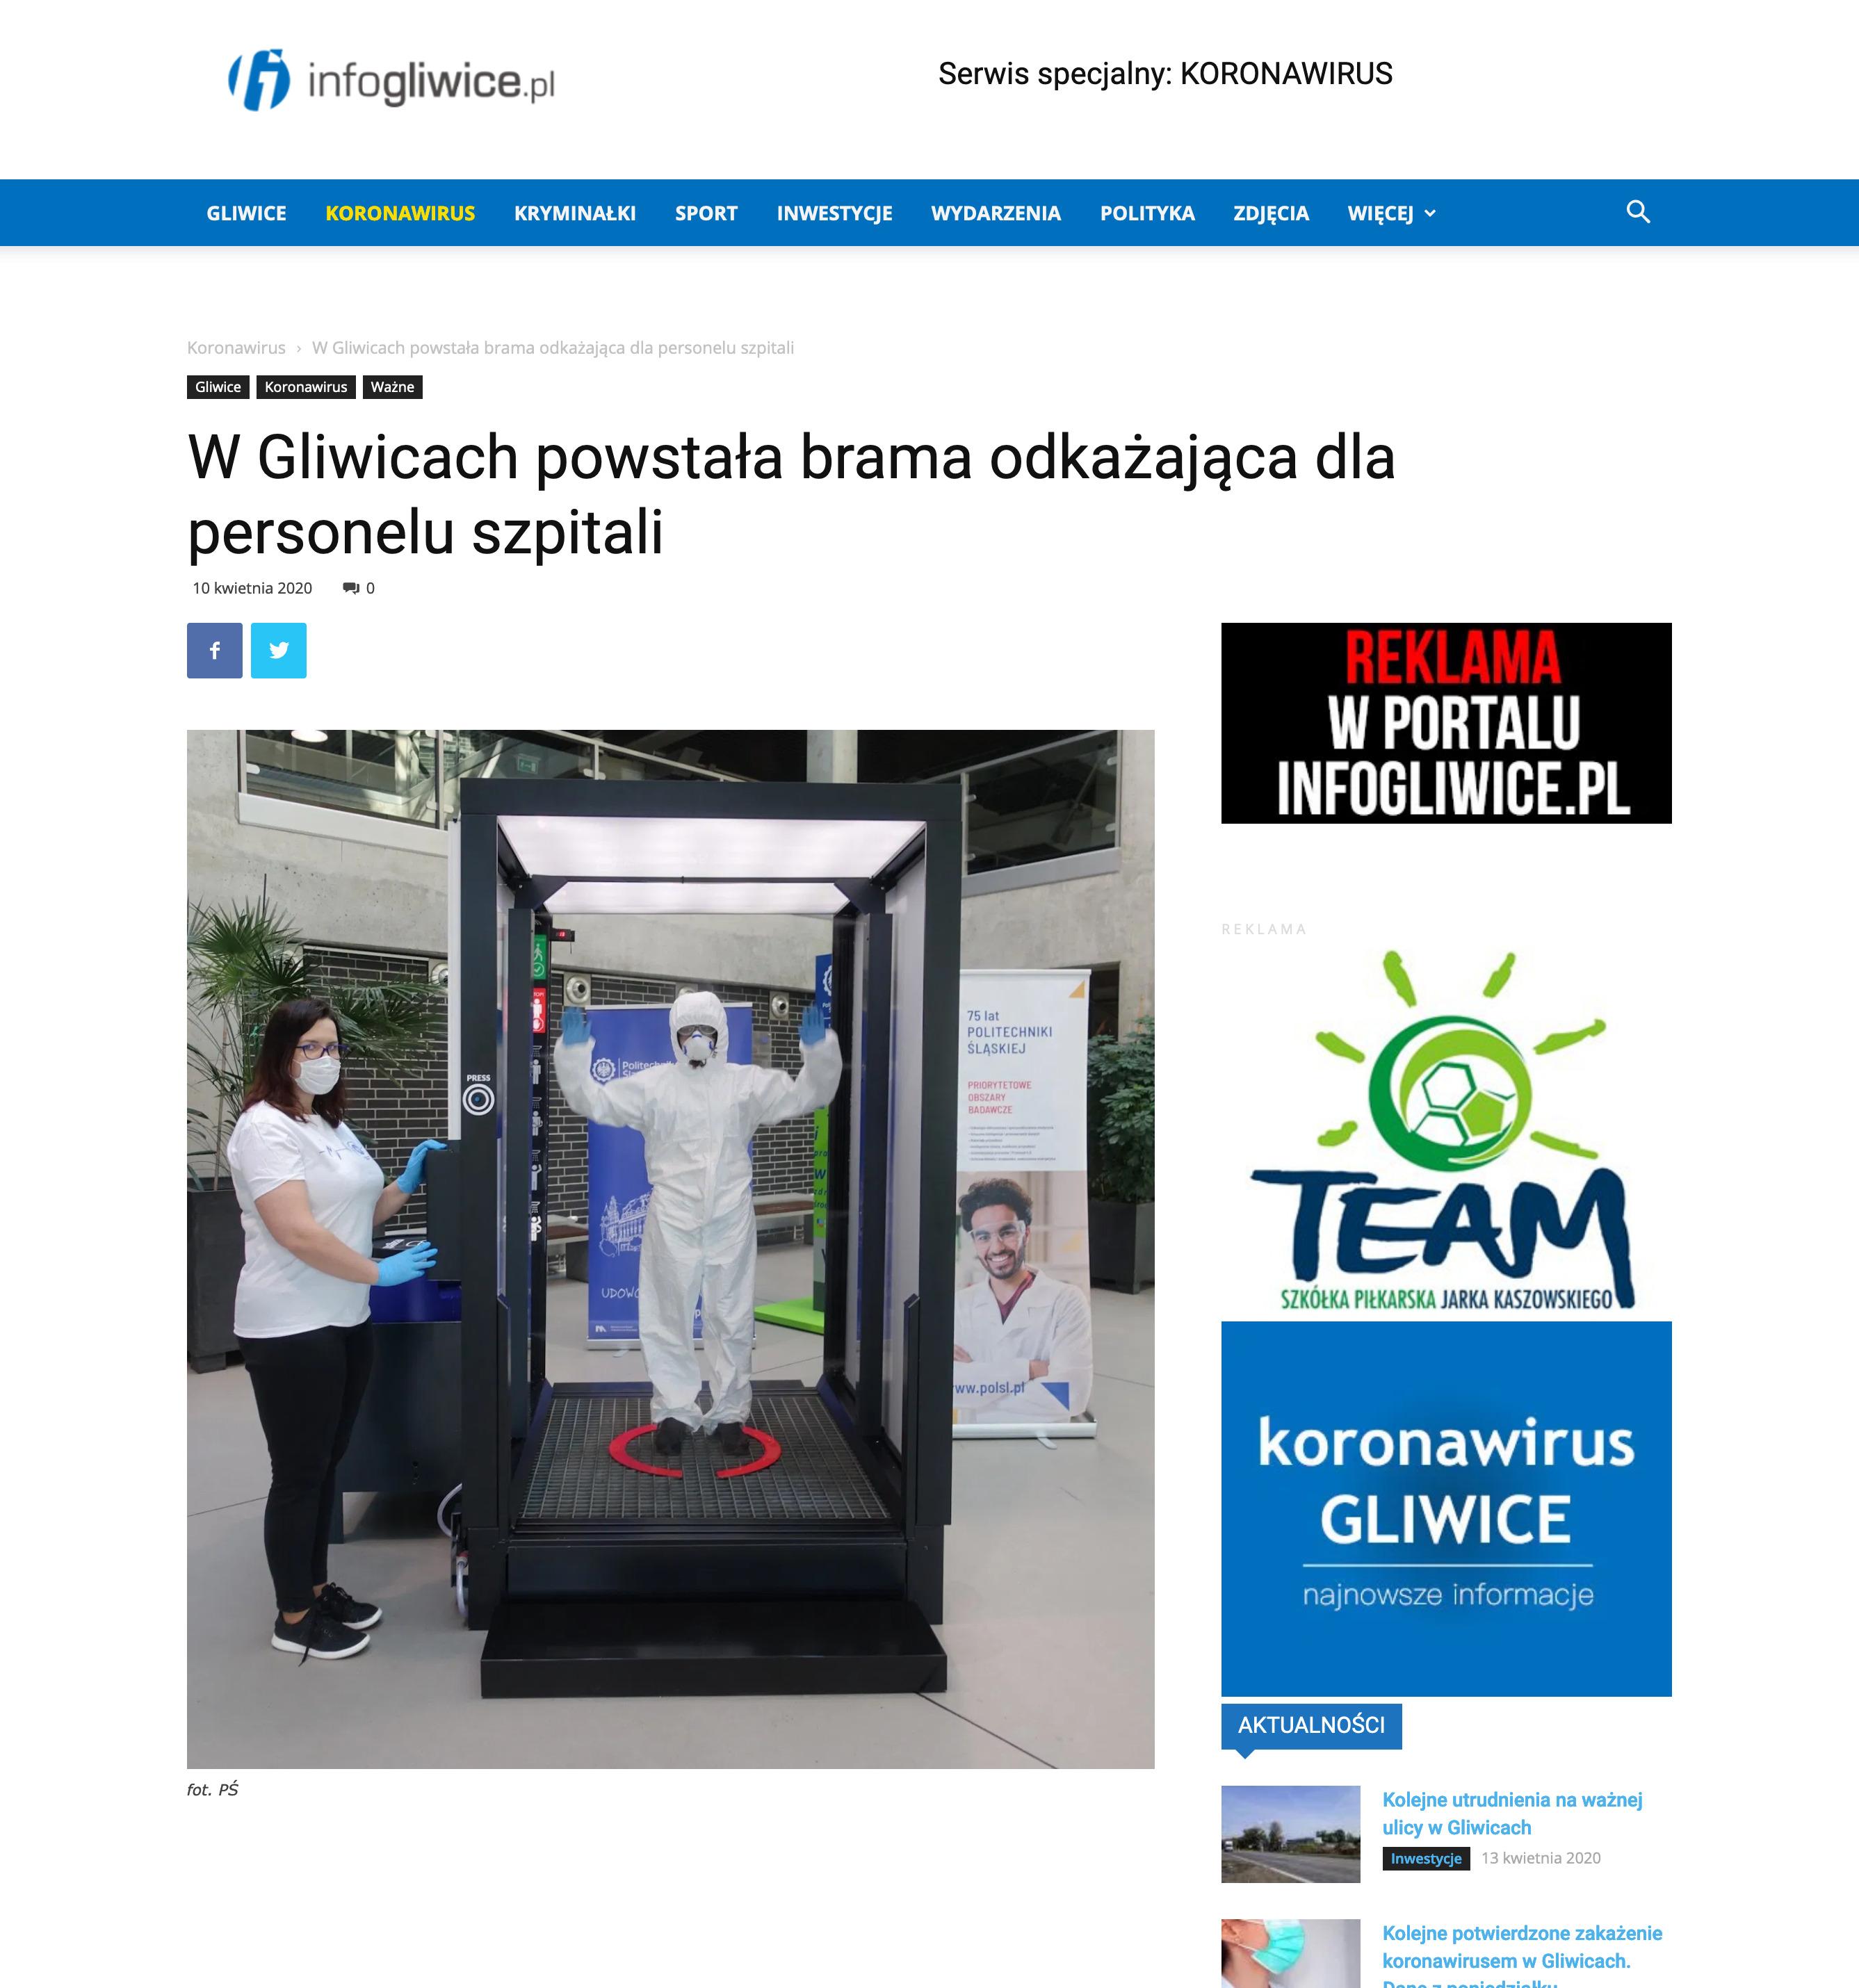 infogliwice.pl